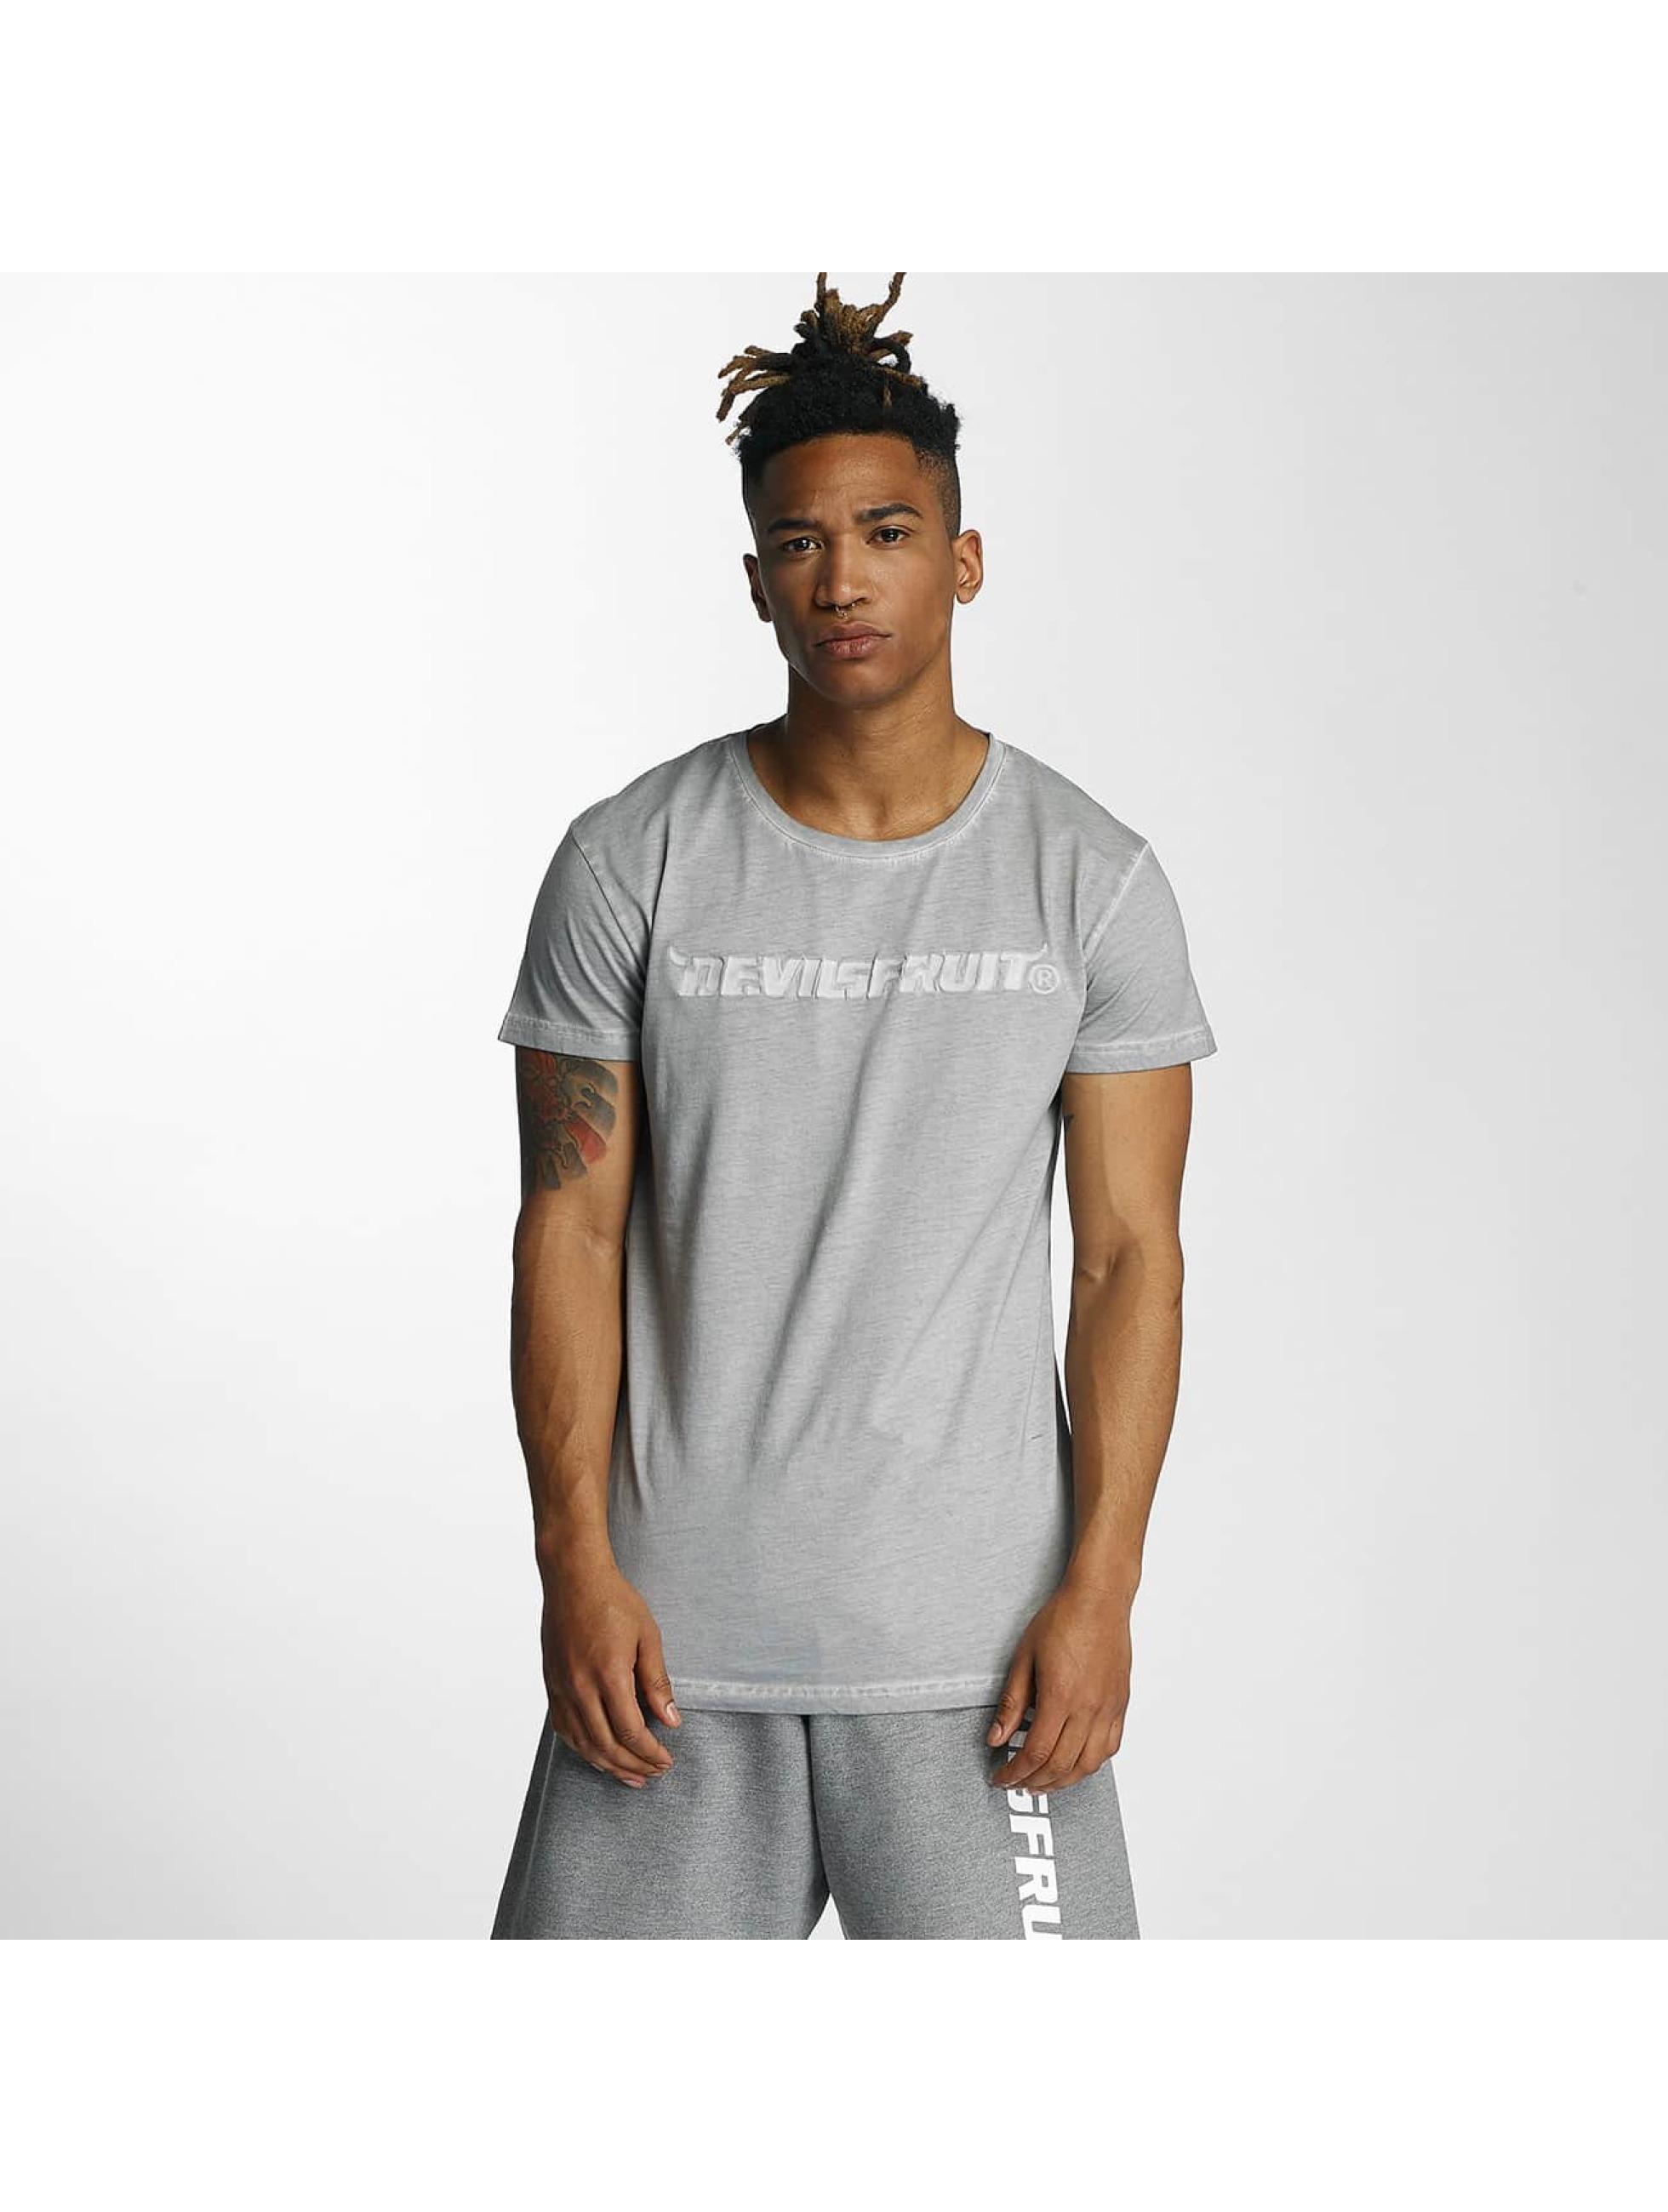 Devilsfruit t-shirt Holla grijs